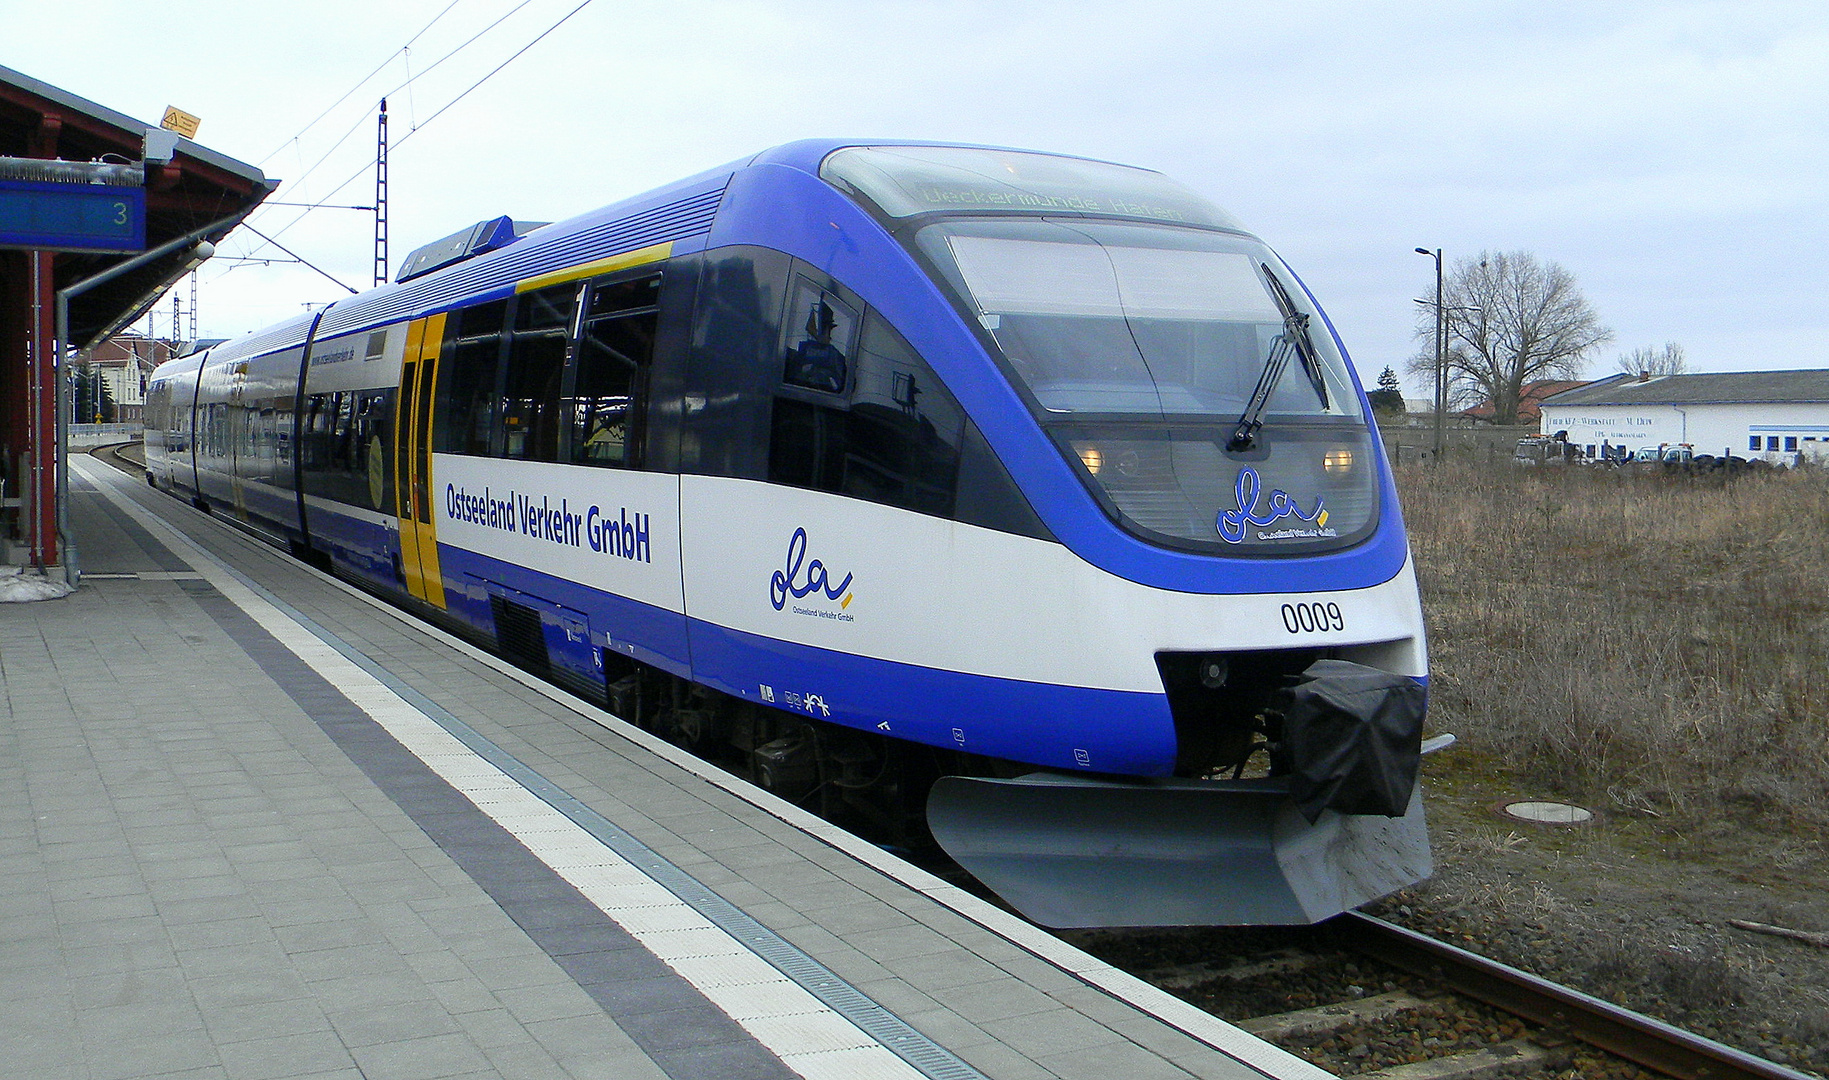 Ostseeland Verkehr GmbH VT 0009